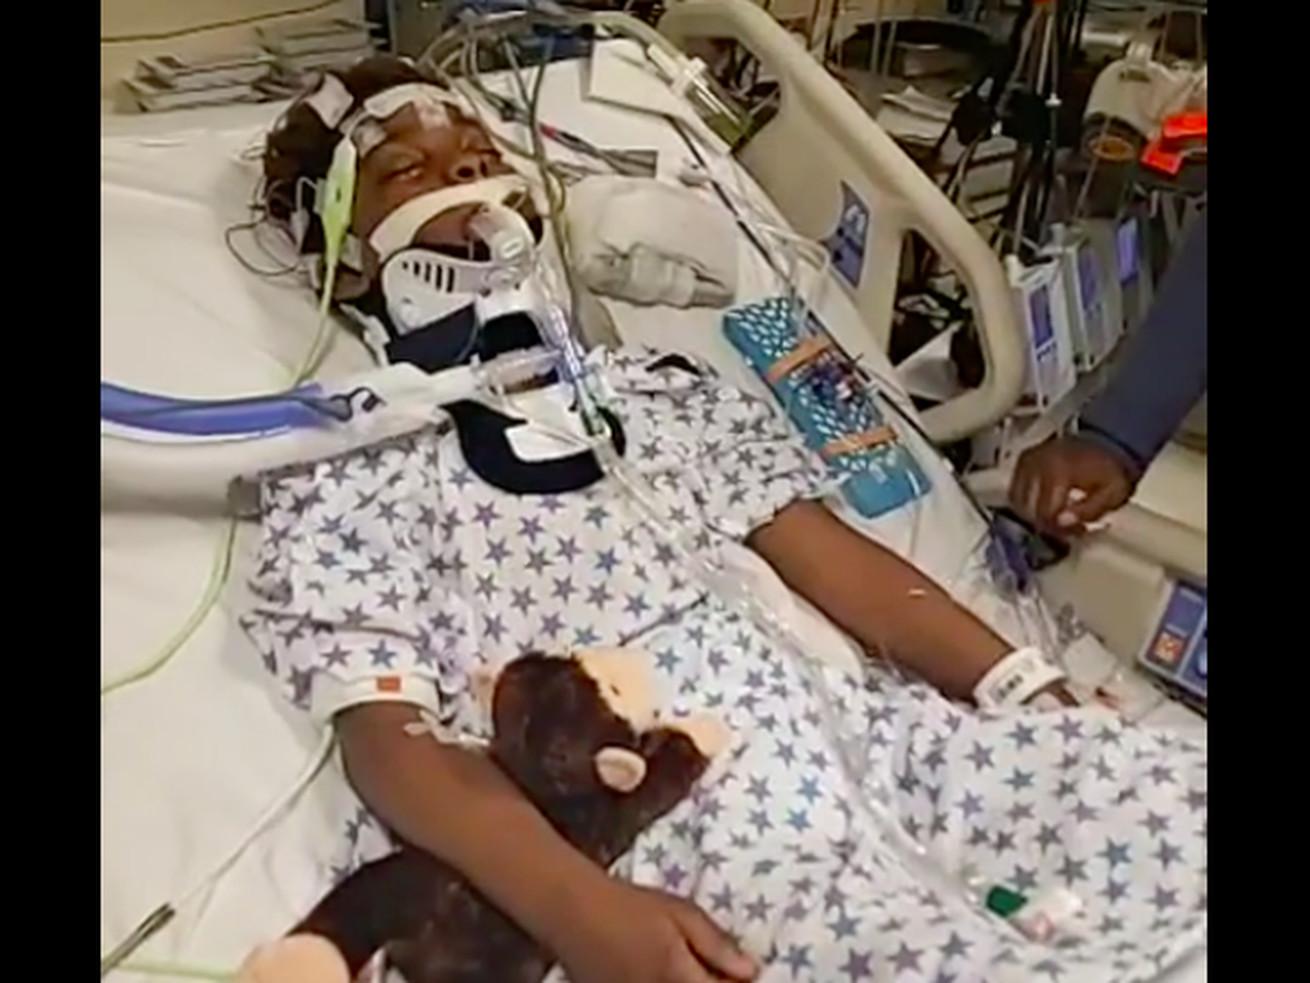 Jamari Dent shown hospitalized at Comer Children's Hospital in 2019.